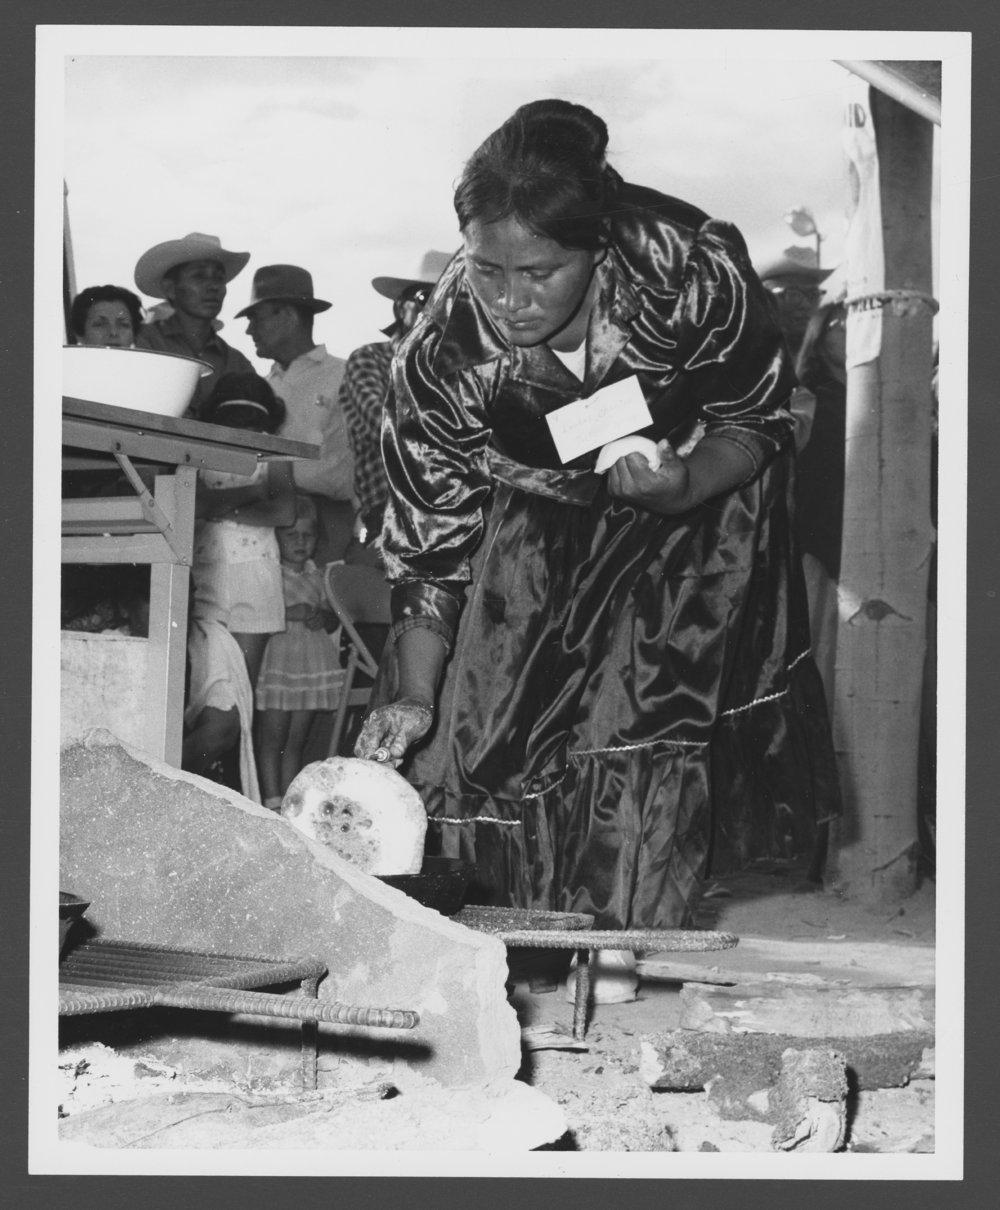 Navajo Tribal Fair, Window Rock, Arizona - 1